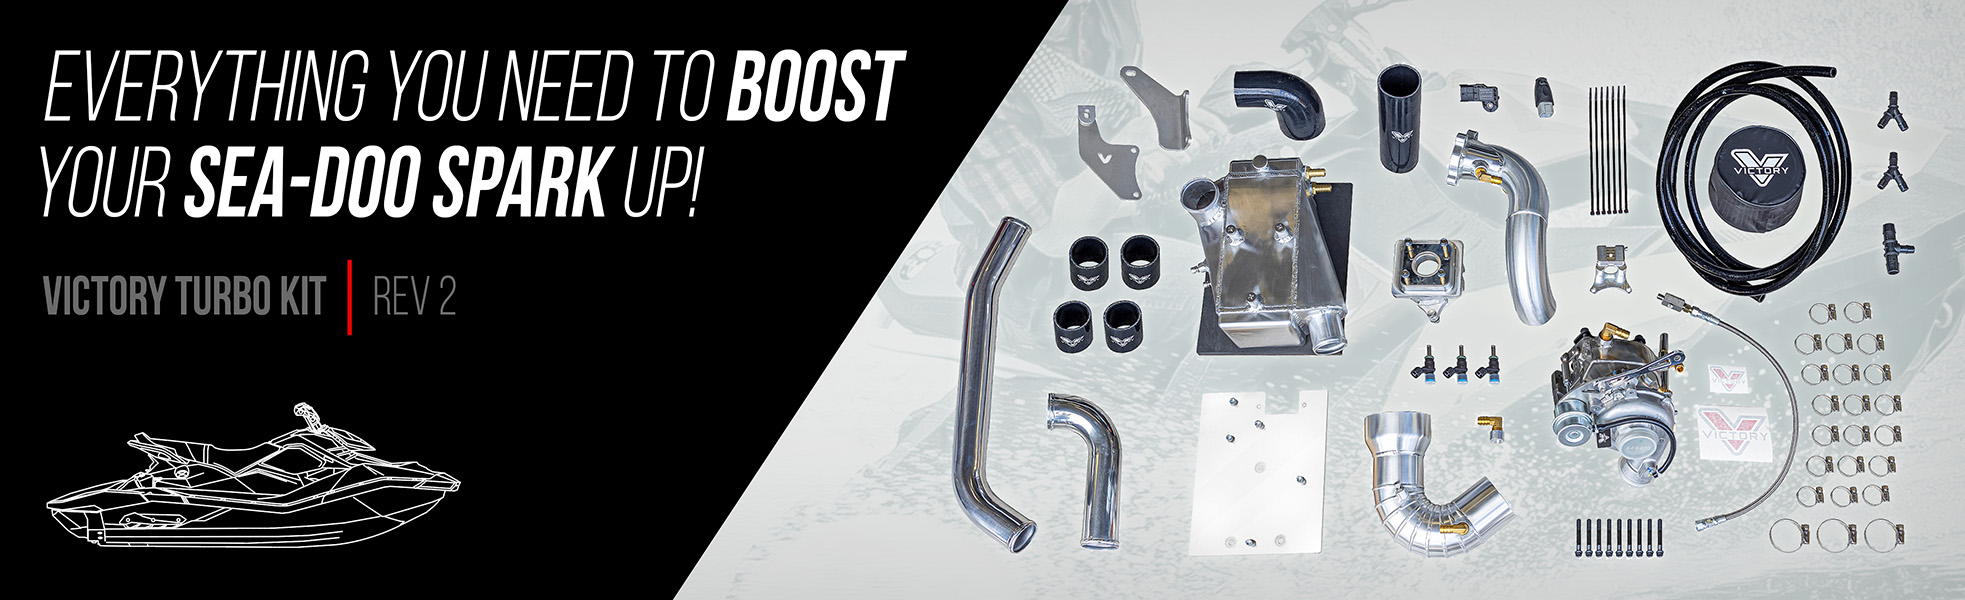 SEA-DOO SPARK | Victory Turbo Kit Rev2